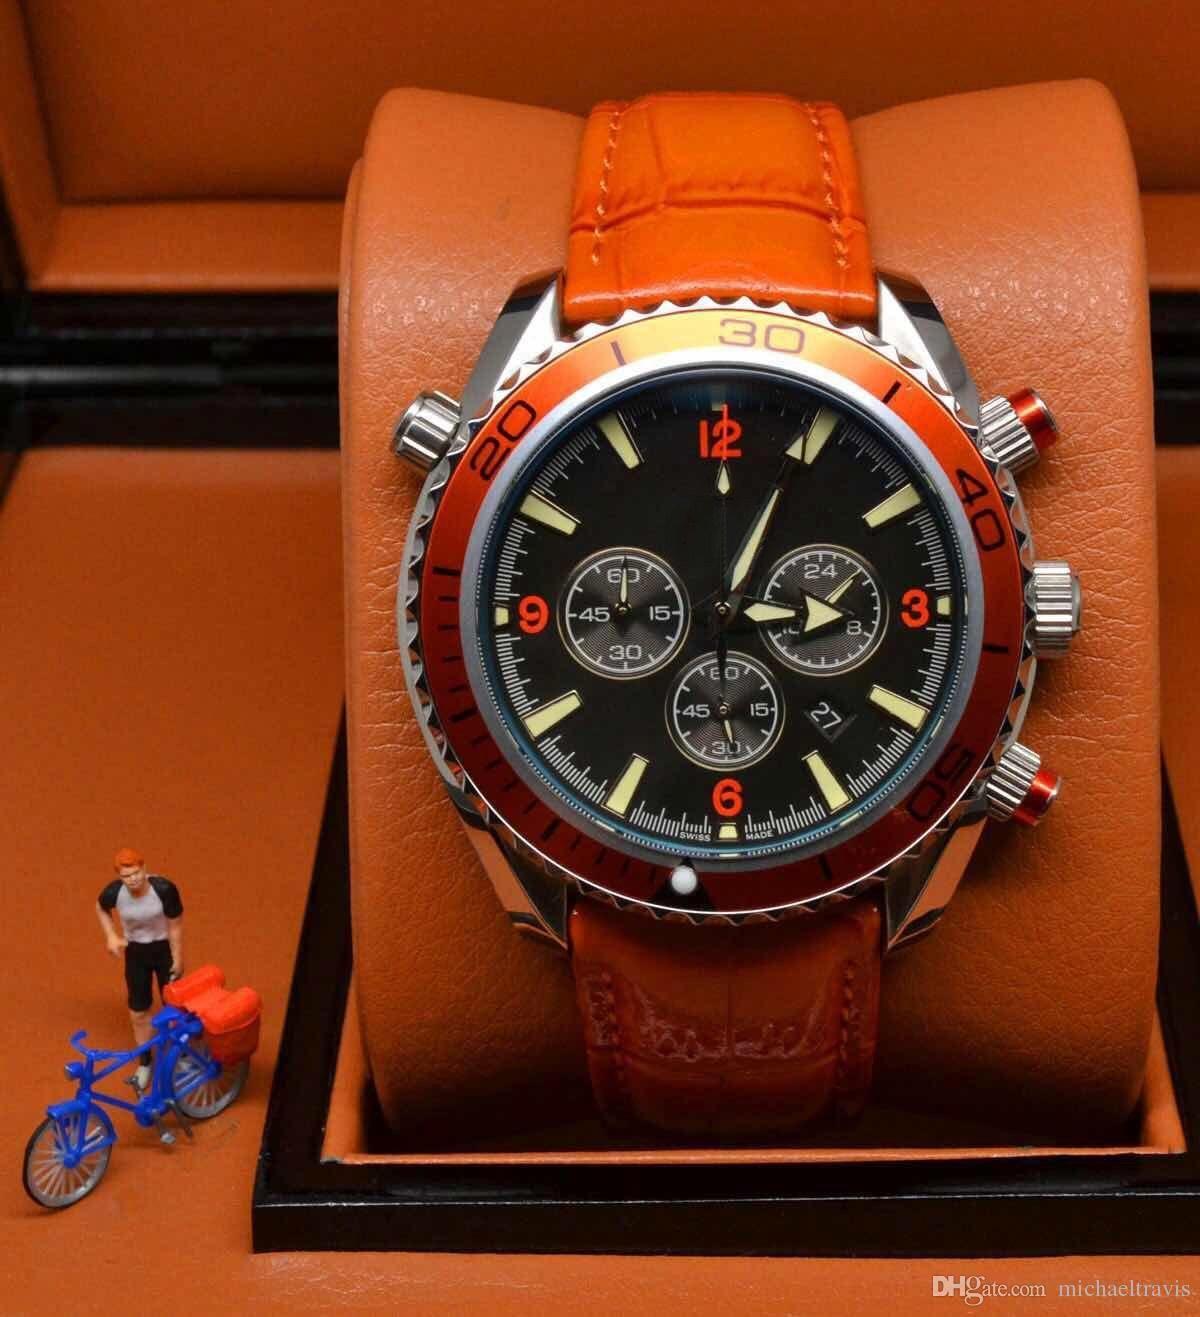 Luxury Brand Sports Quarz Mann Uhr Professionelle Planet Ocean Co Axial Dive Armbanduhr Original Schließe